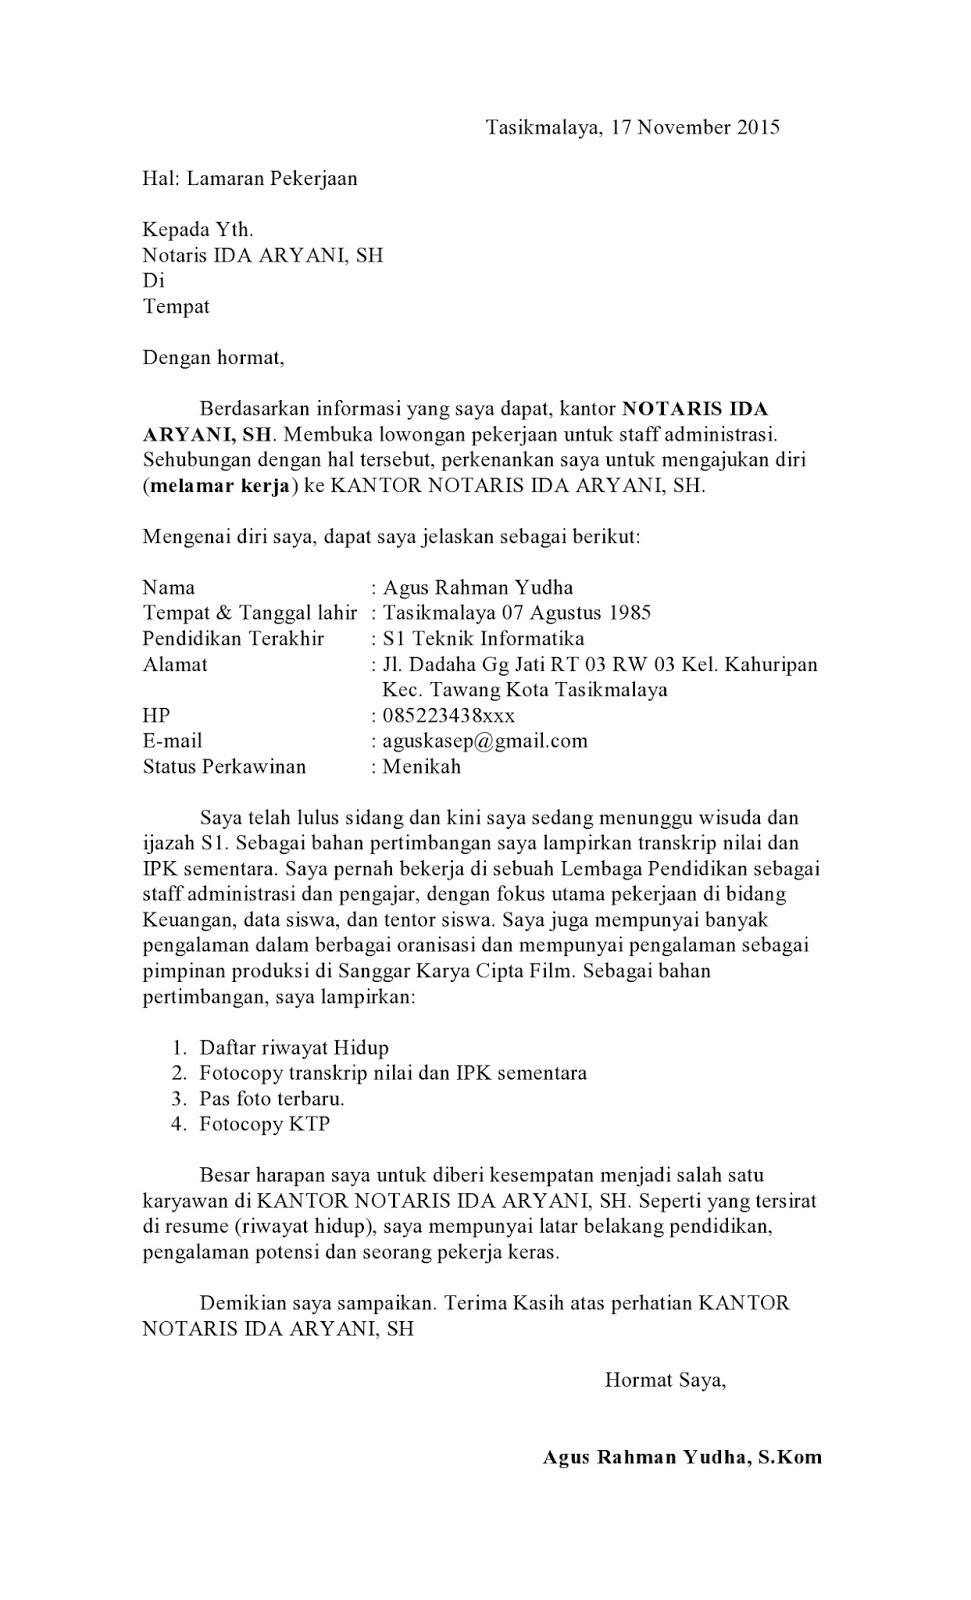 Contoh Surat Lamaran Kerja Ke Notaris Terbaru 2017 - ben jobs